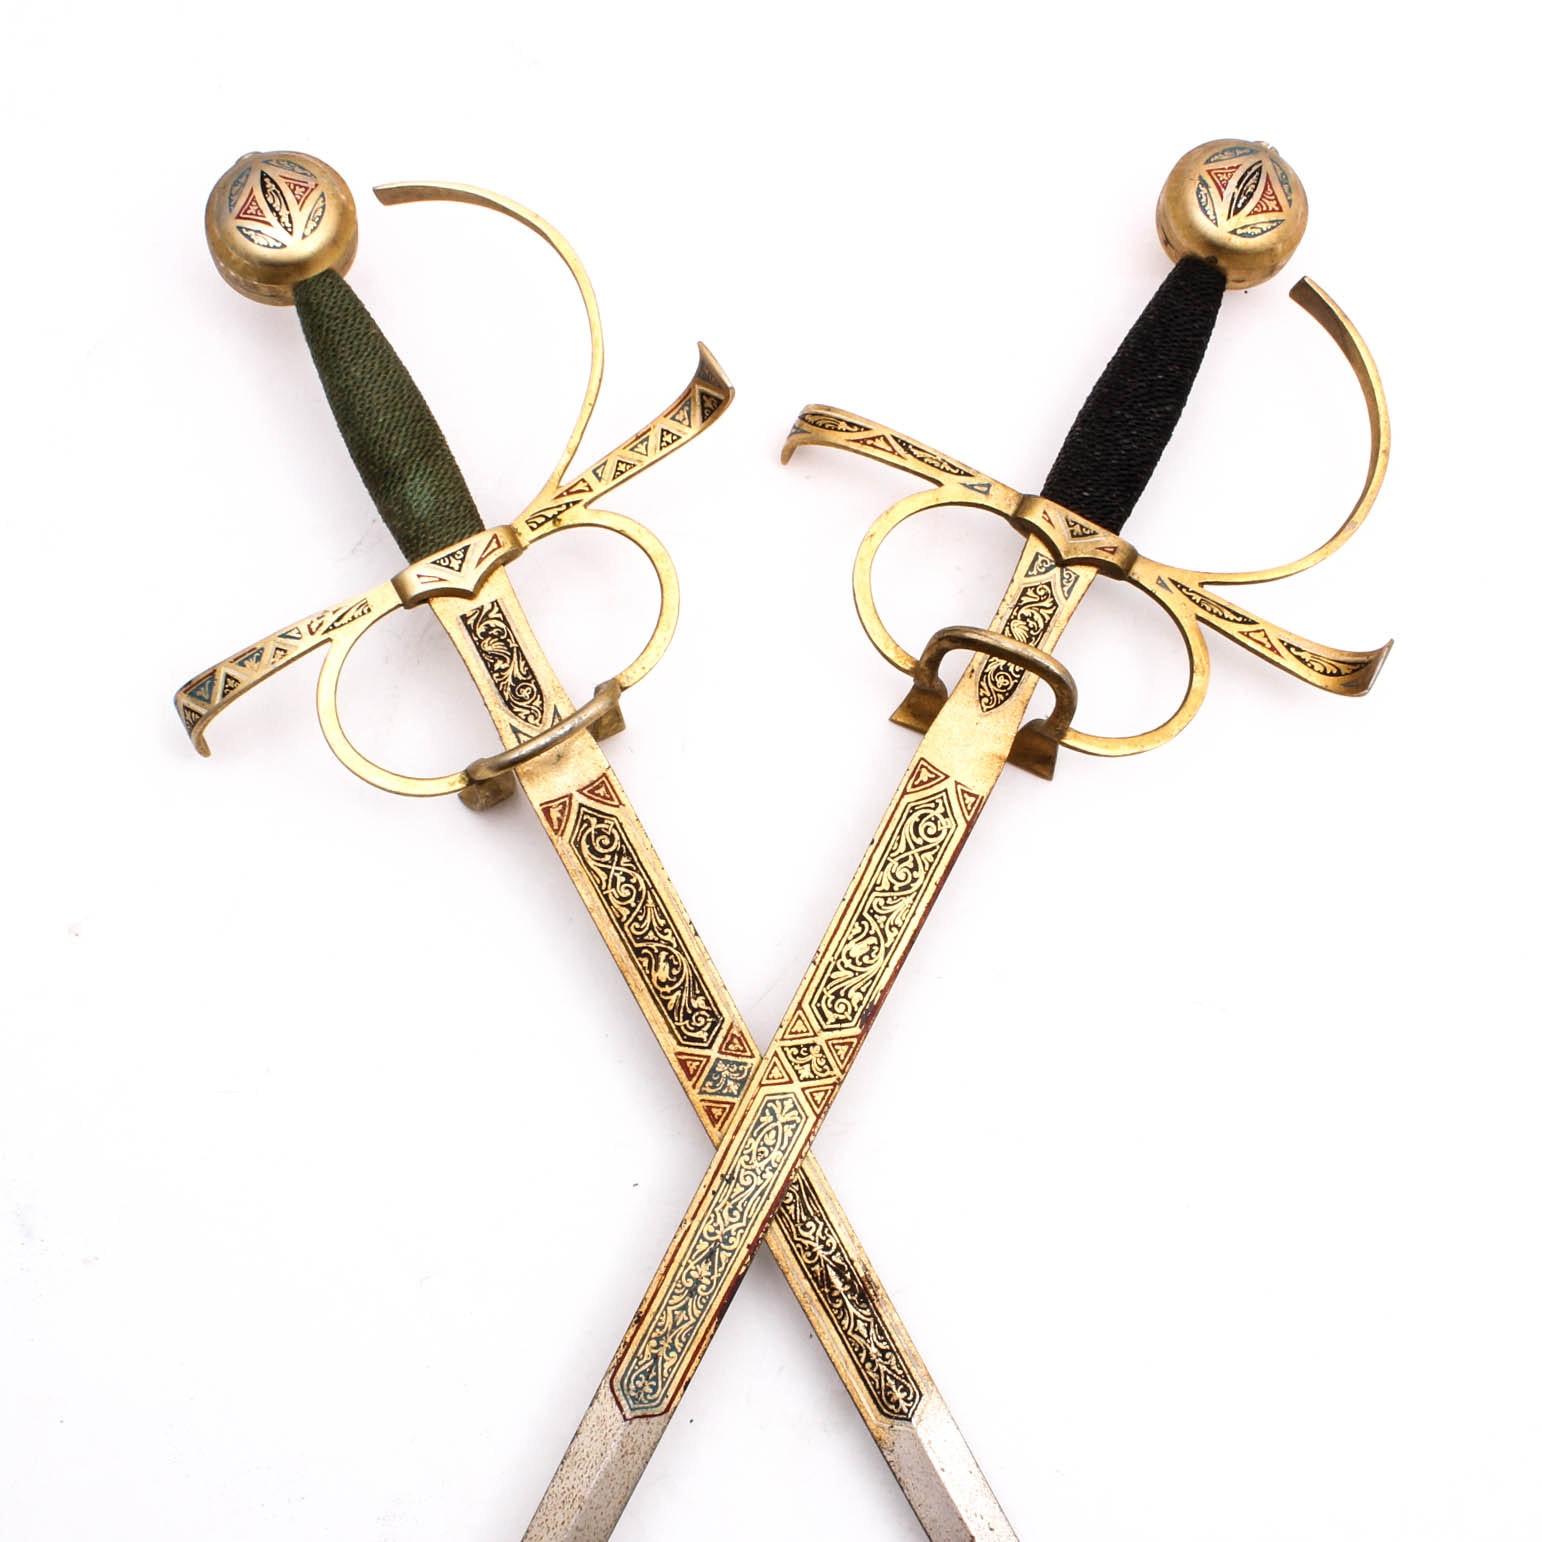 Decorative Enameled Swords